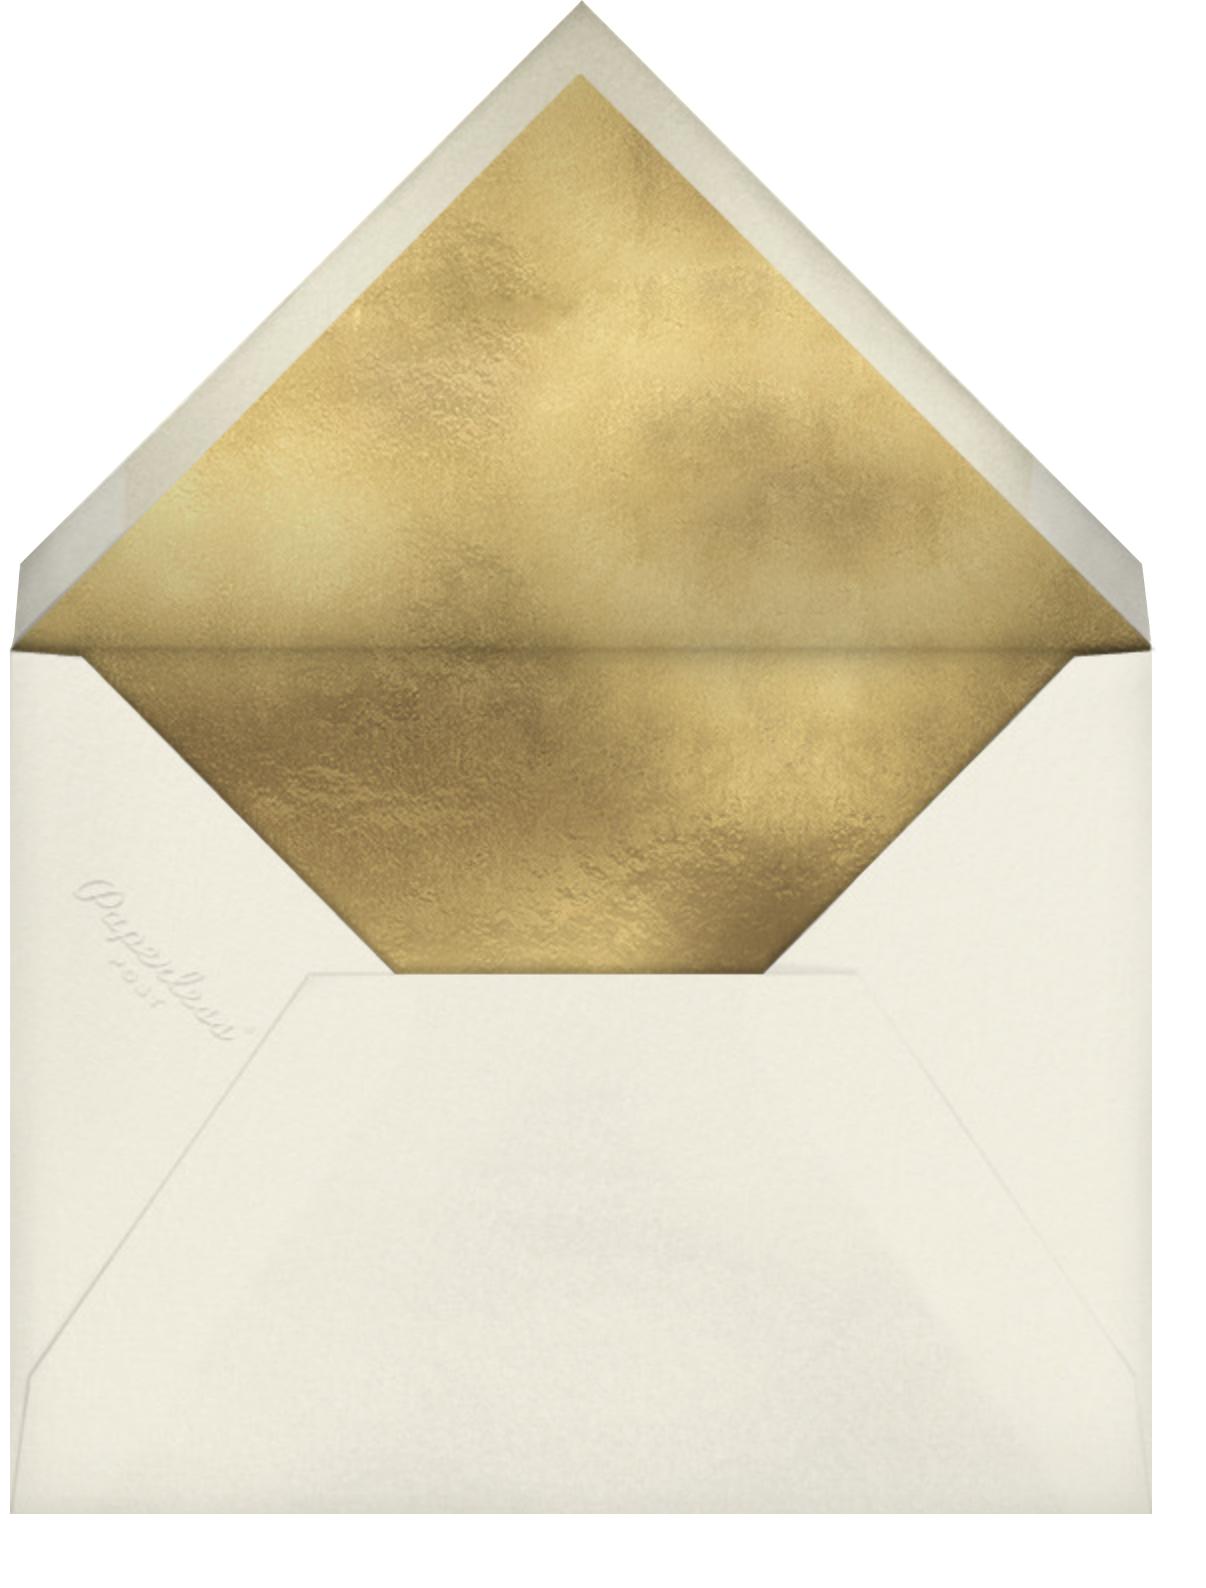 Cennini - Greenwood (Invitation) - Paperless Post - All - envelope back